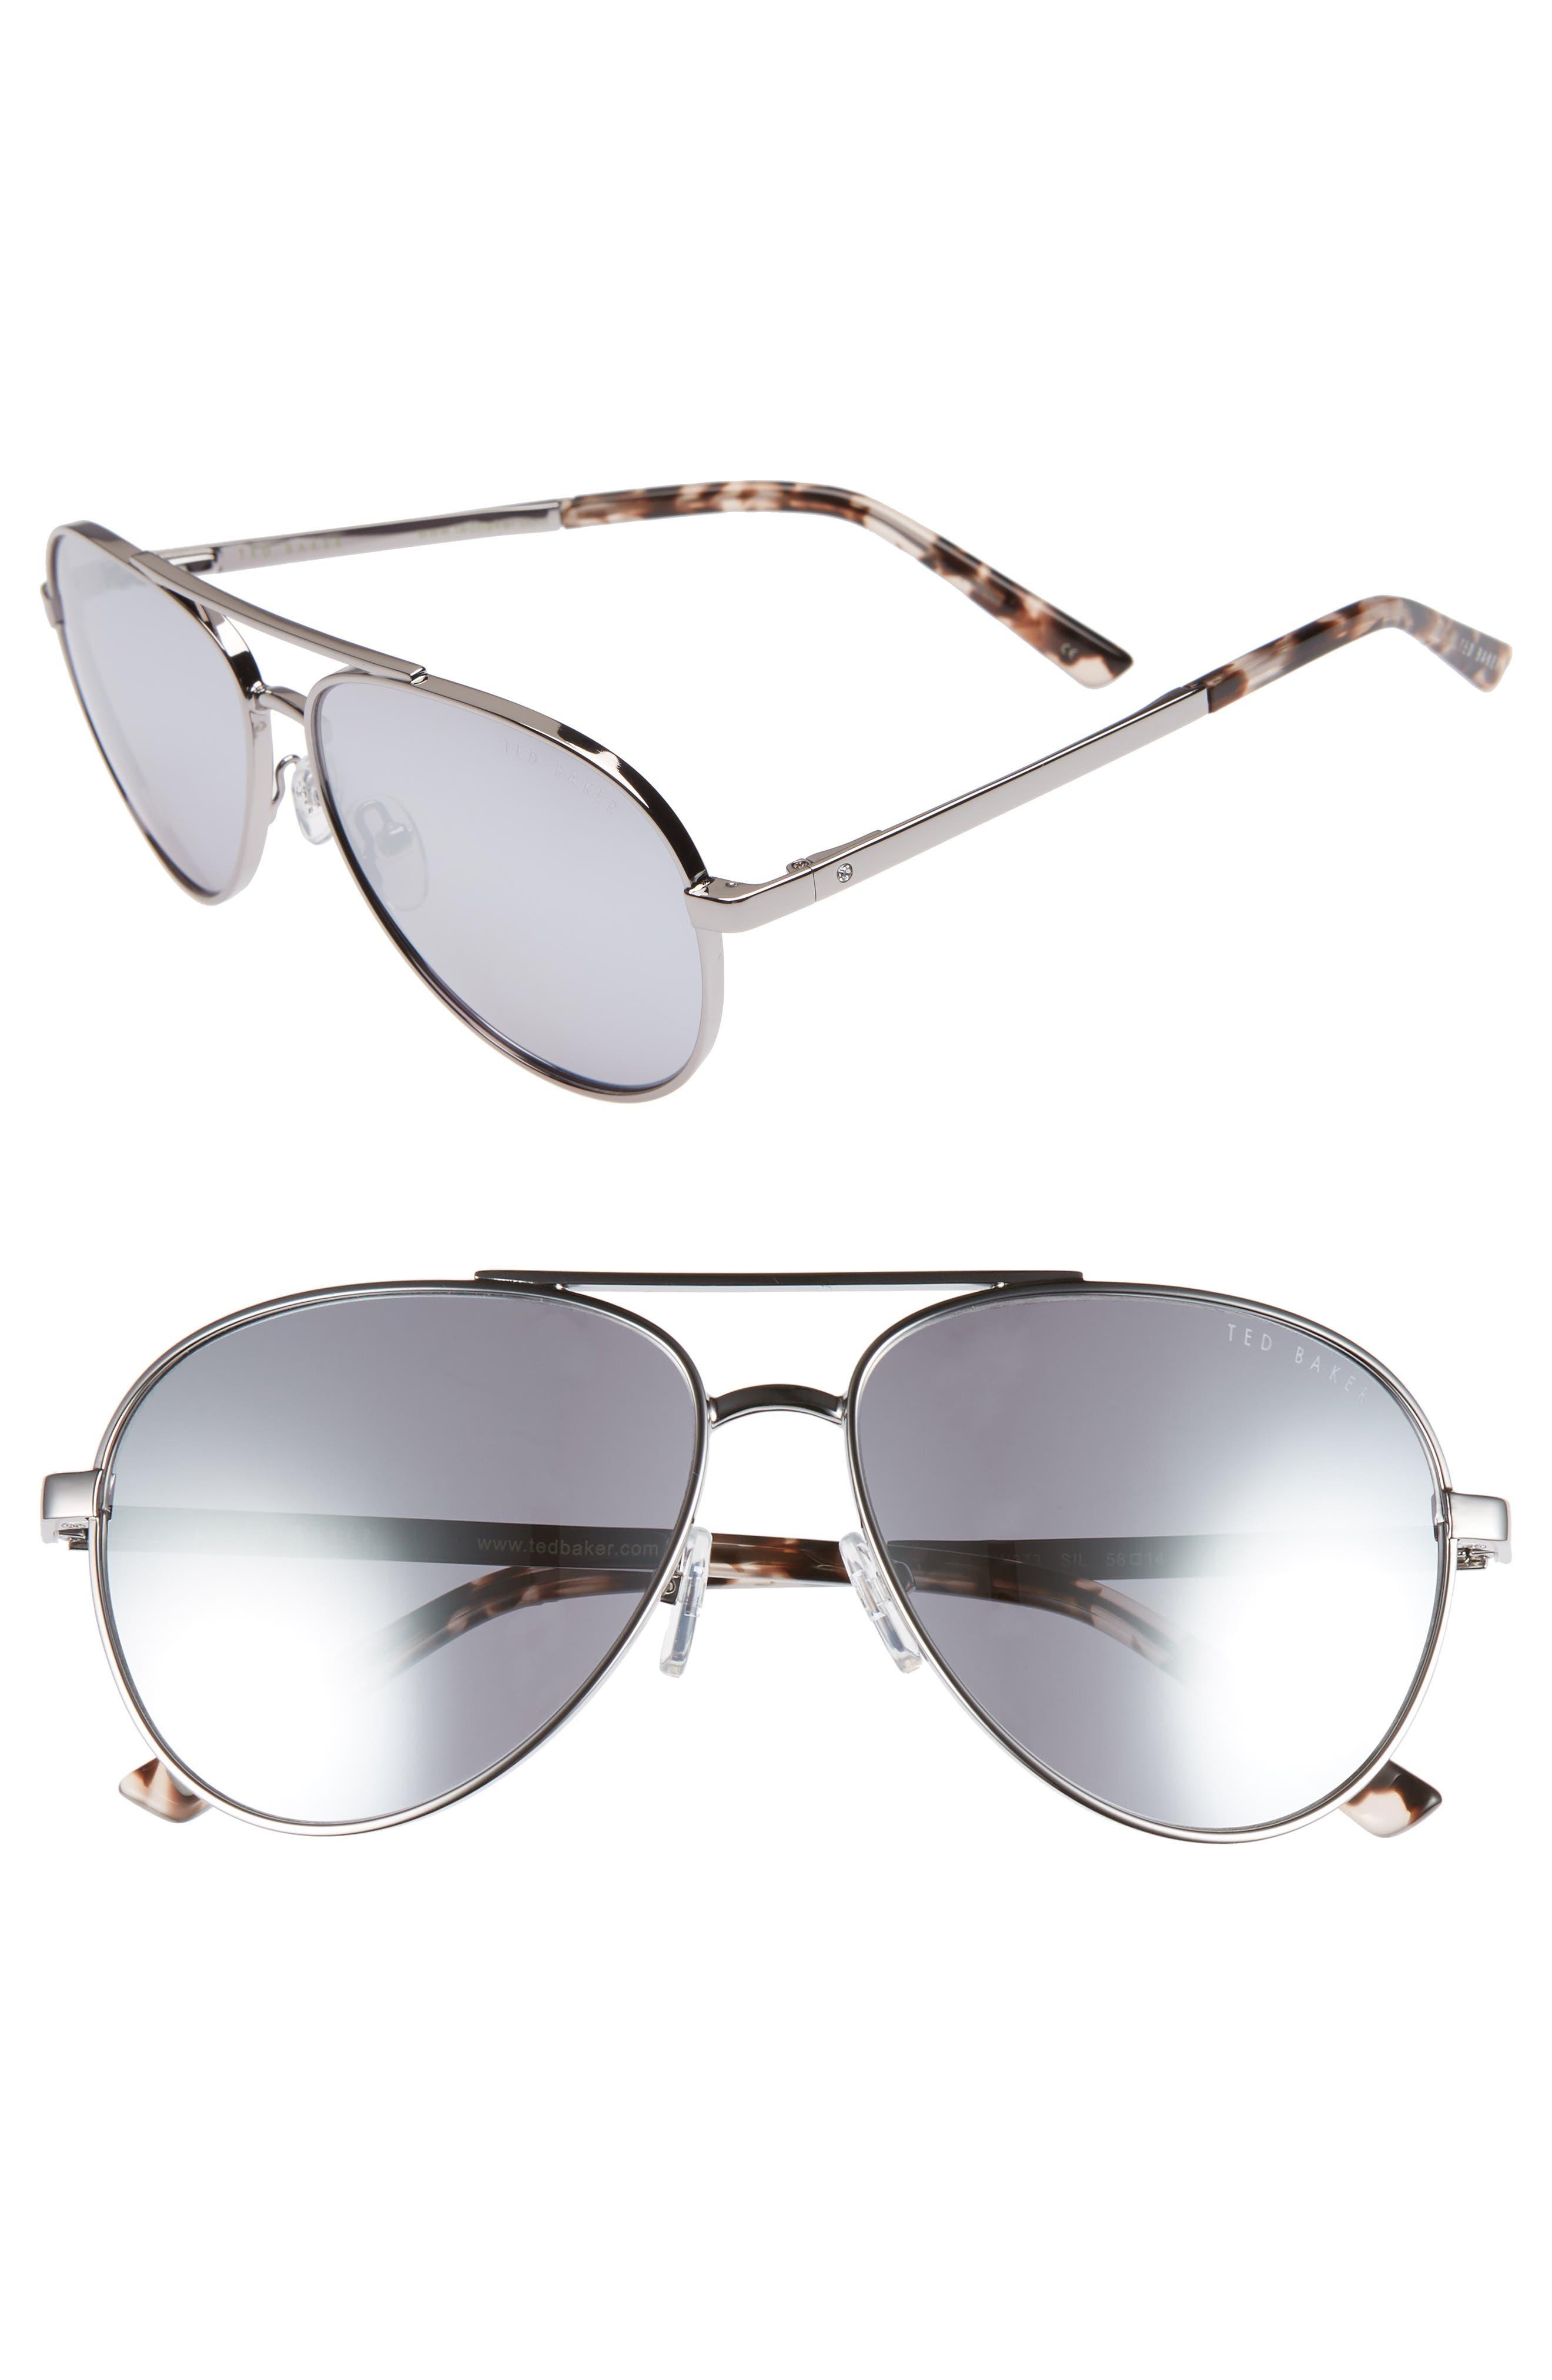 58mm Aviator Sunglasses,                             Main thumbnail 1, color,                             SILVER